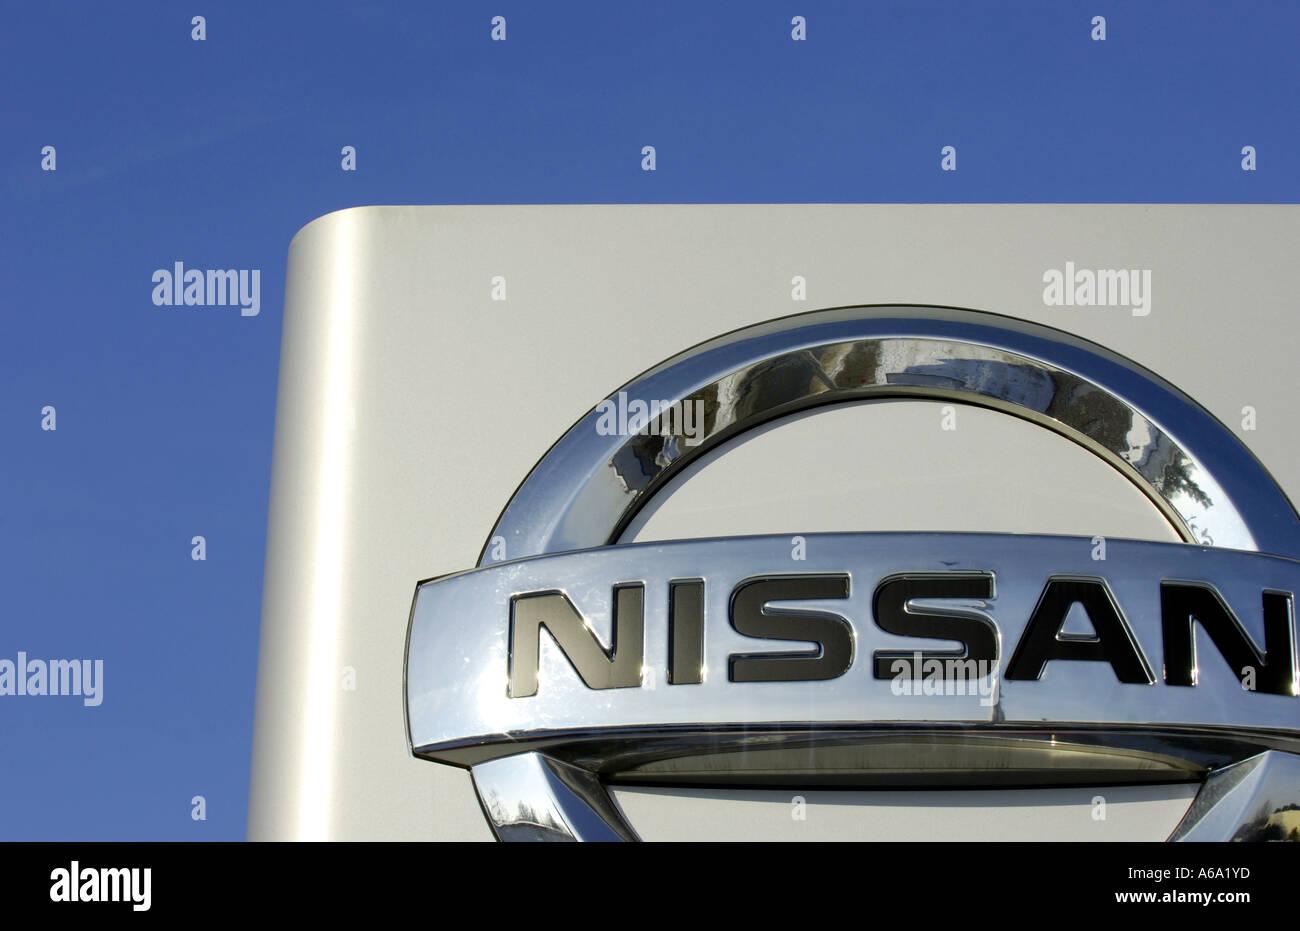 nissan japan japanese car manufacturer company asian asia sign Stock